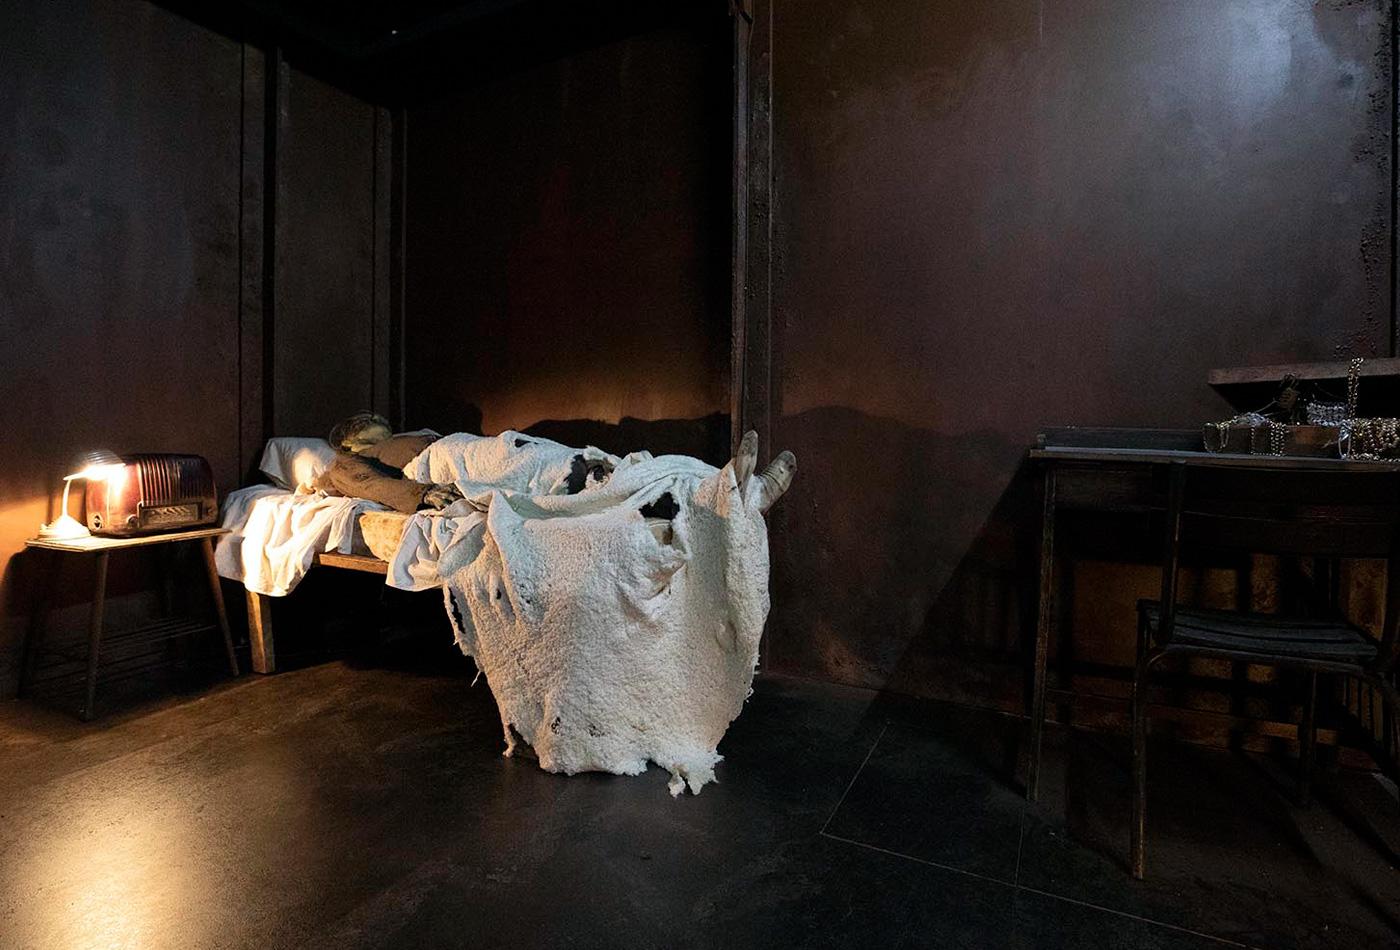 manofmedan-niceone-barcelona-bandai-darkpictures-generalitat-creartiva-